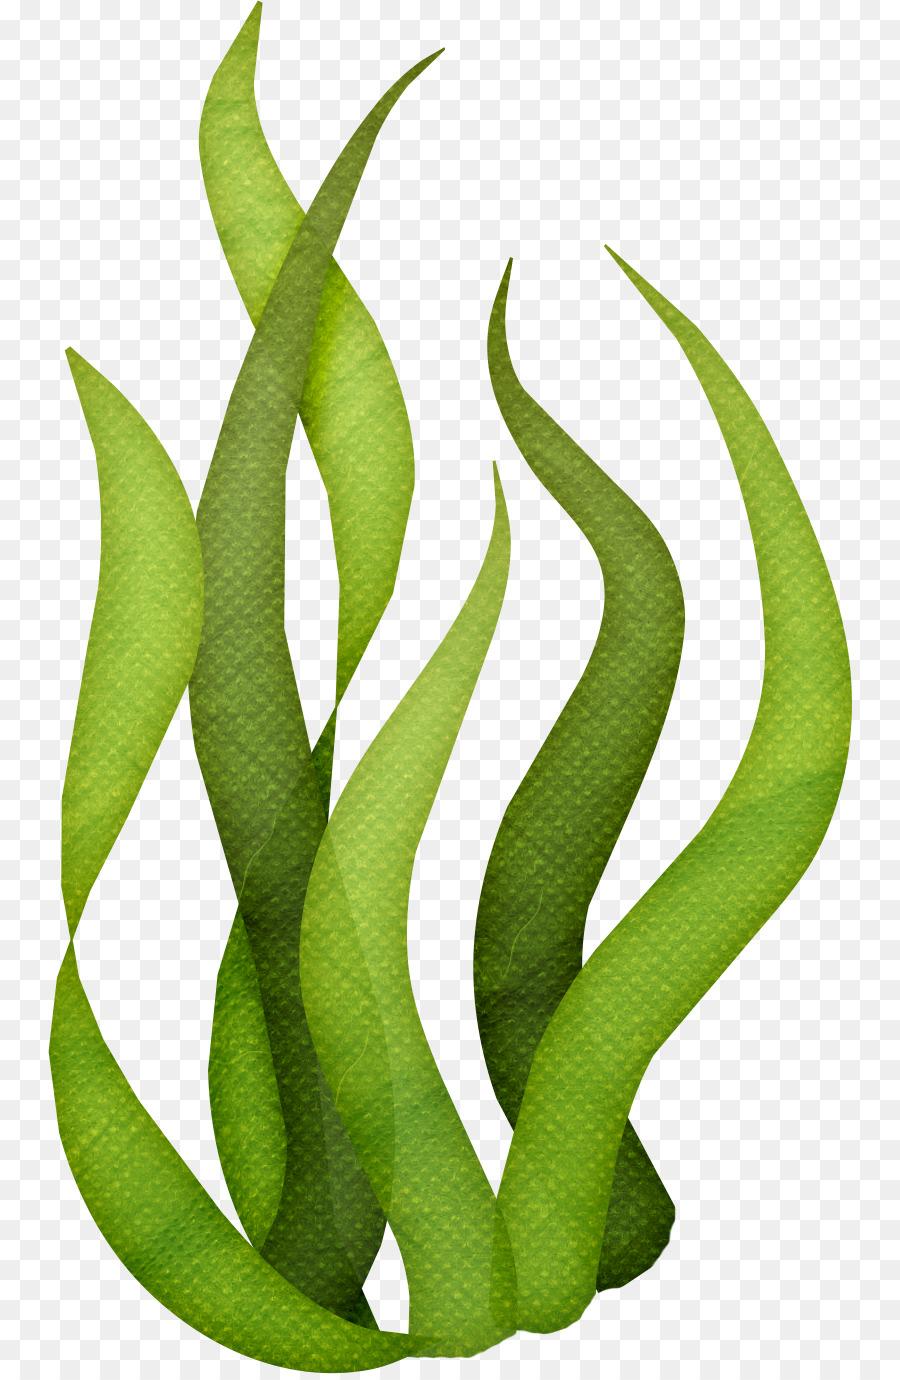 seaweed algae clip art ocean png download 804 1374 free rh kisspng com seaweed clip art free seaweed clip art black and white